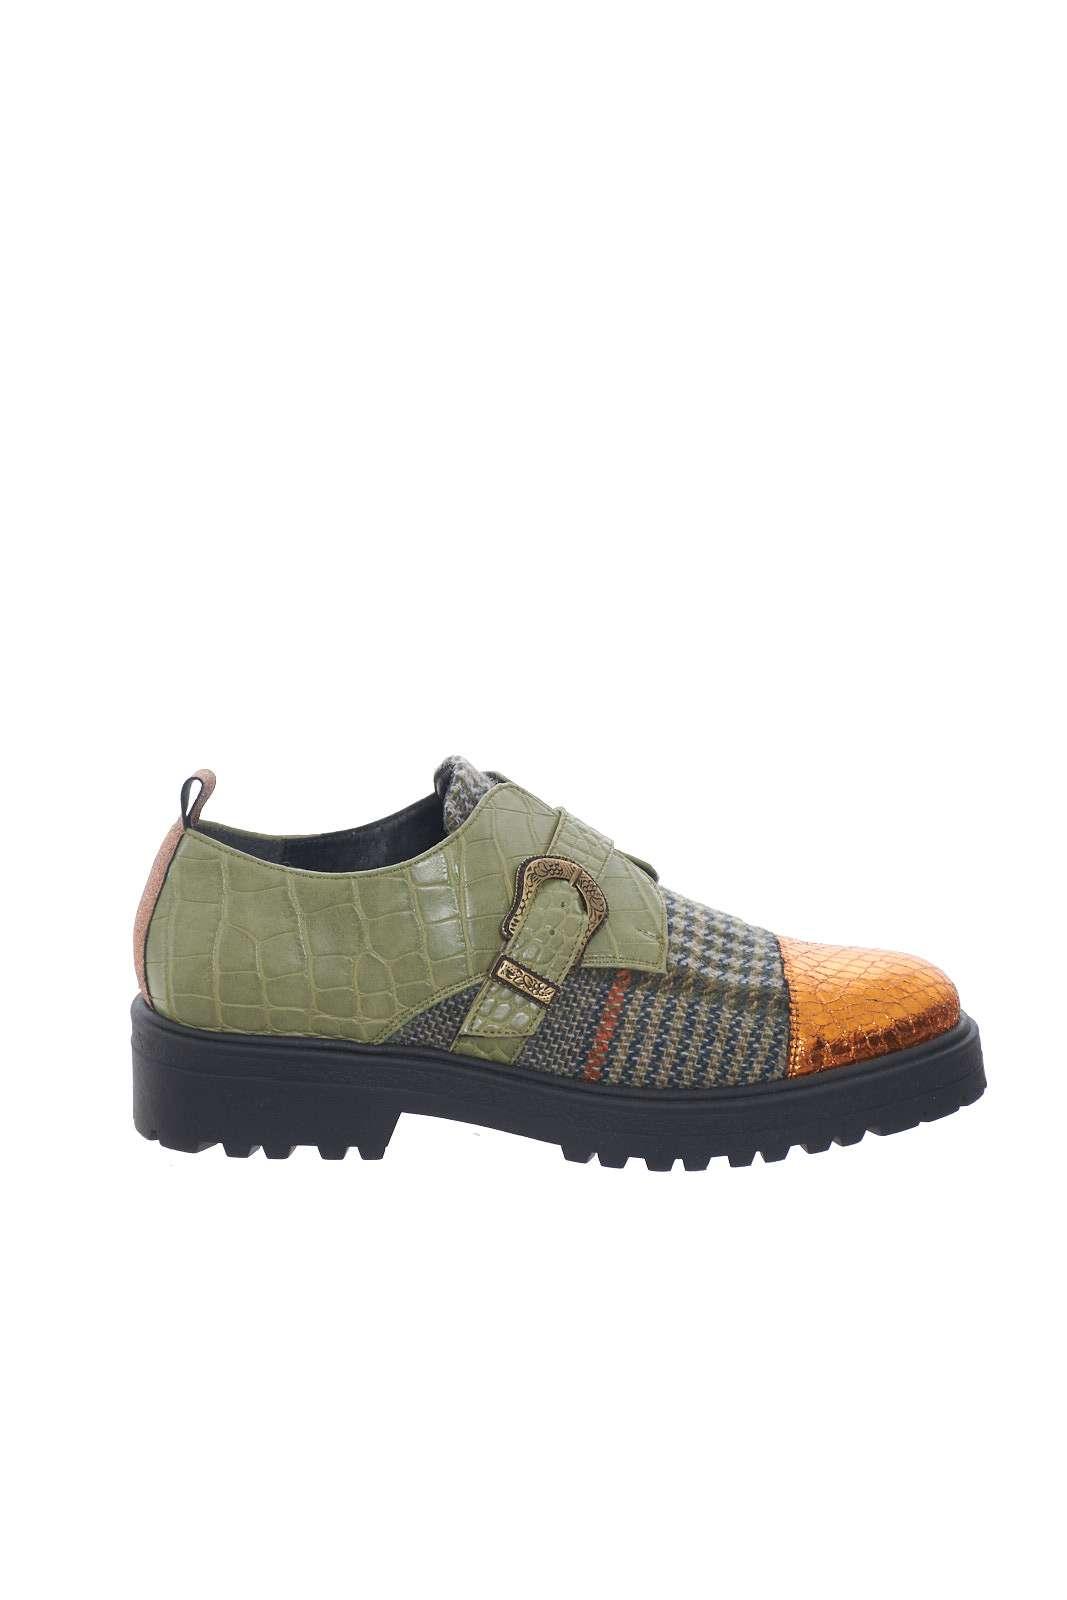 https://www.parmax.com/media/catalog/product/a/i/AI-outlet_parmax-scarpe-donna-Kontessa-F192403-A.jpg